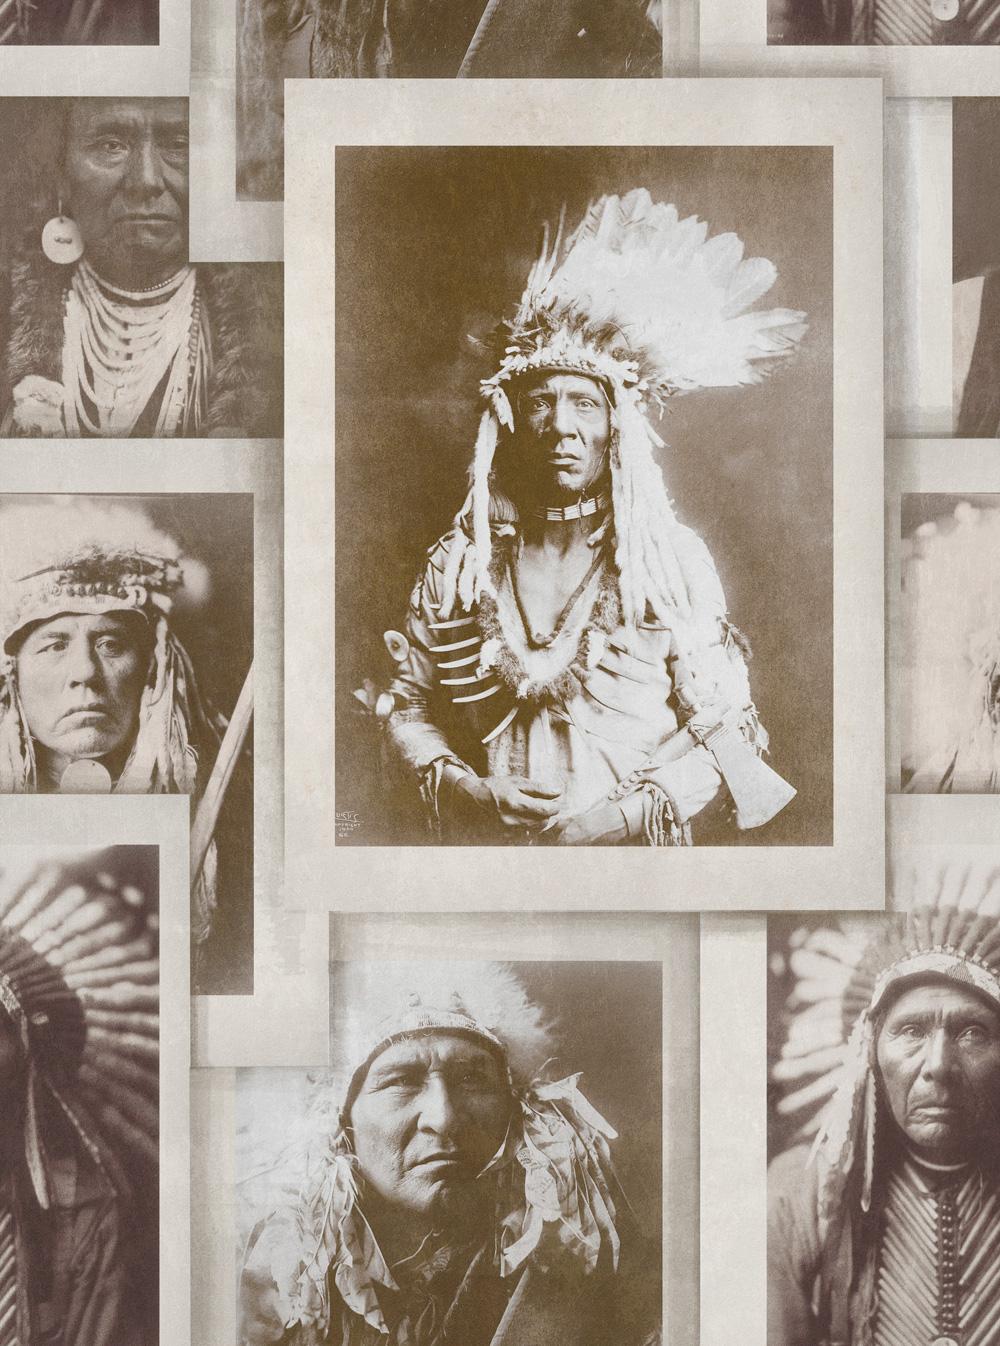 Tapet Designer Portraits Indian Heads Sepia Mindth